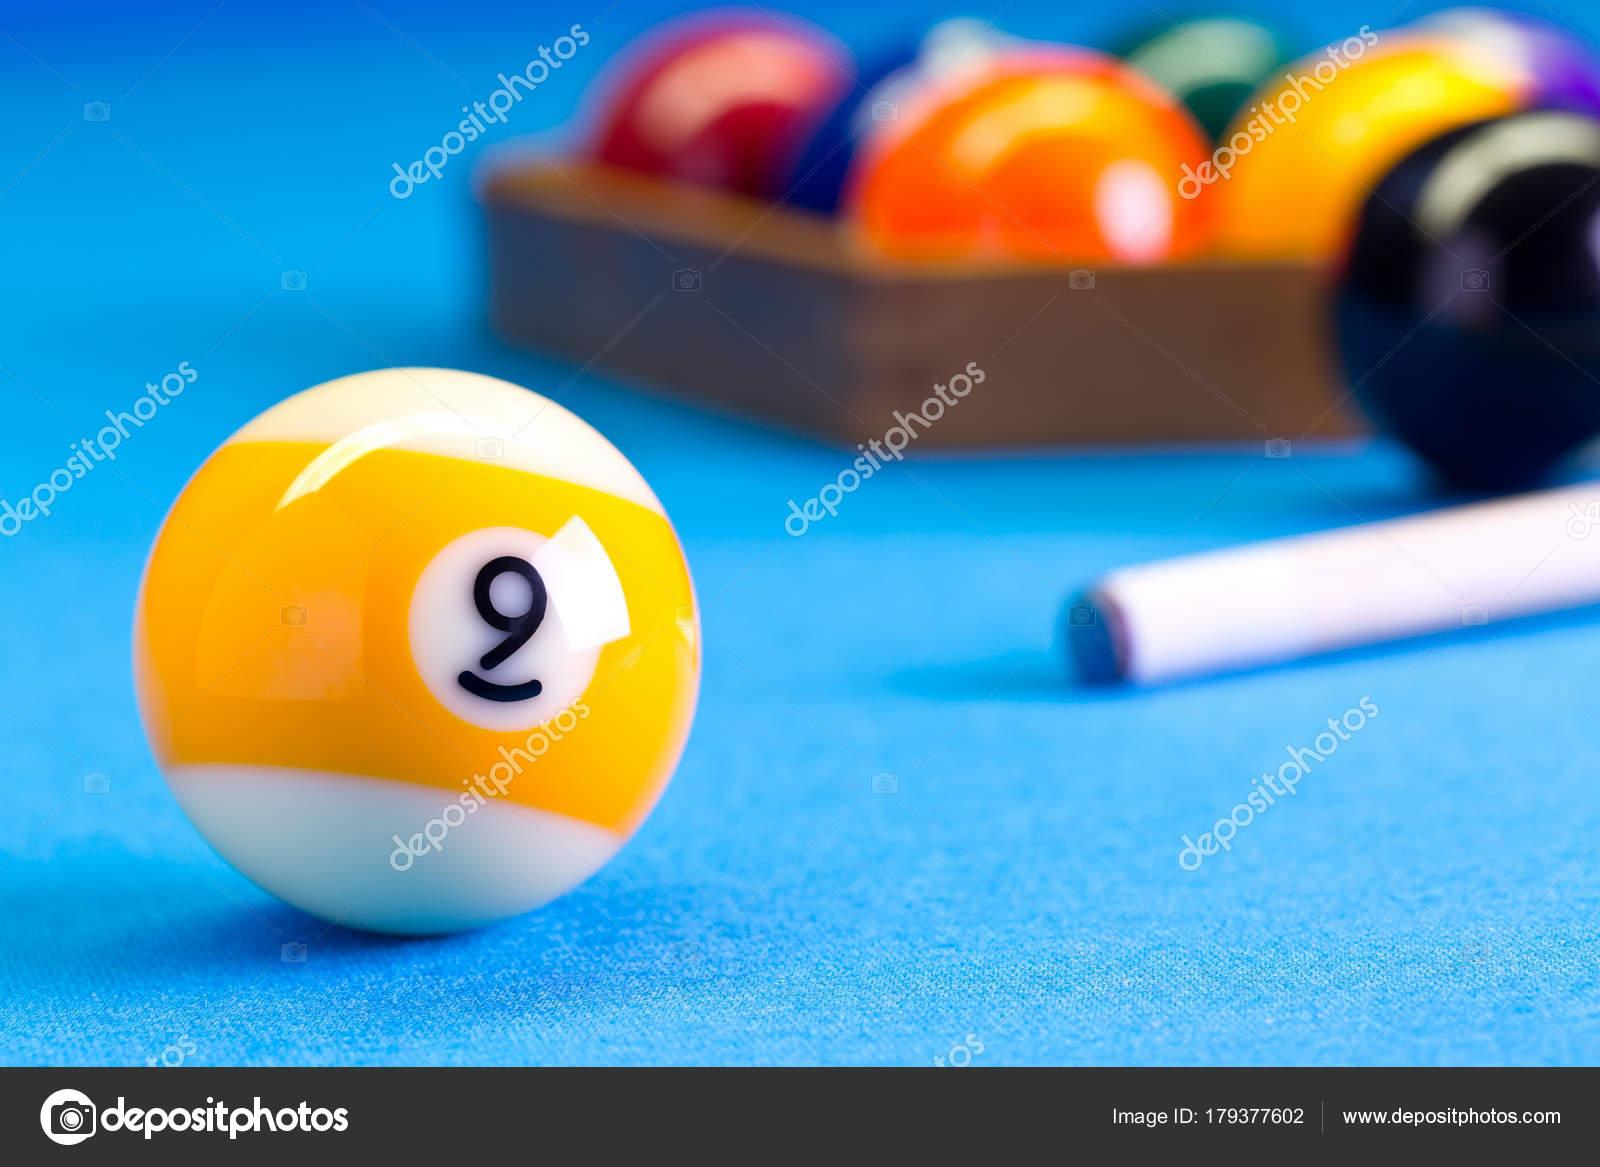 Billard Neuf boule de billard pool jeu neuf avec le repère sur la table de